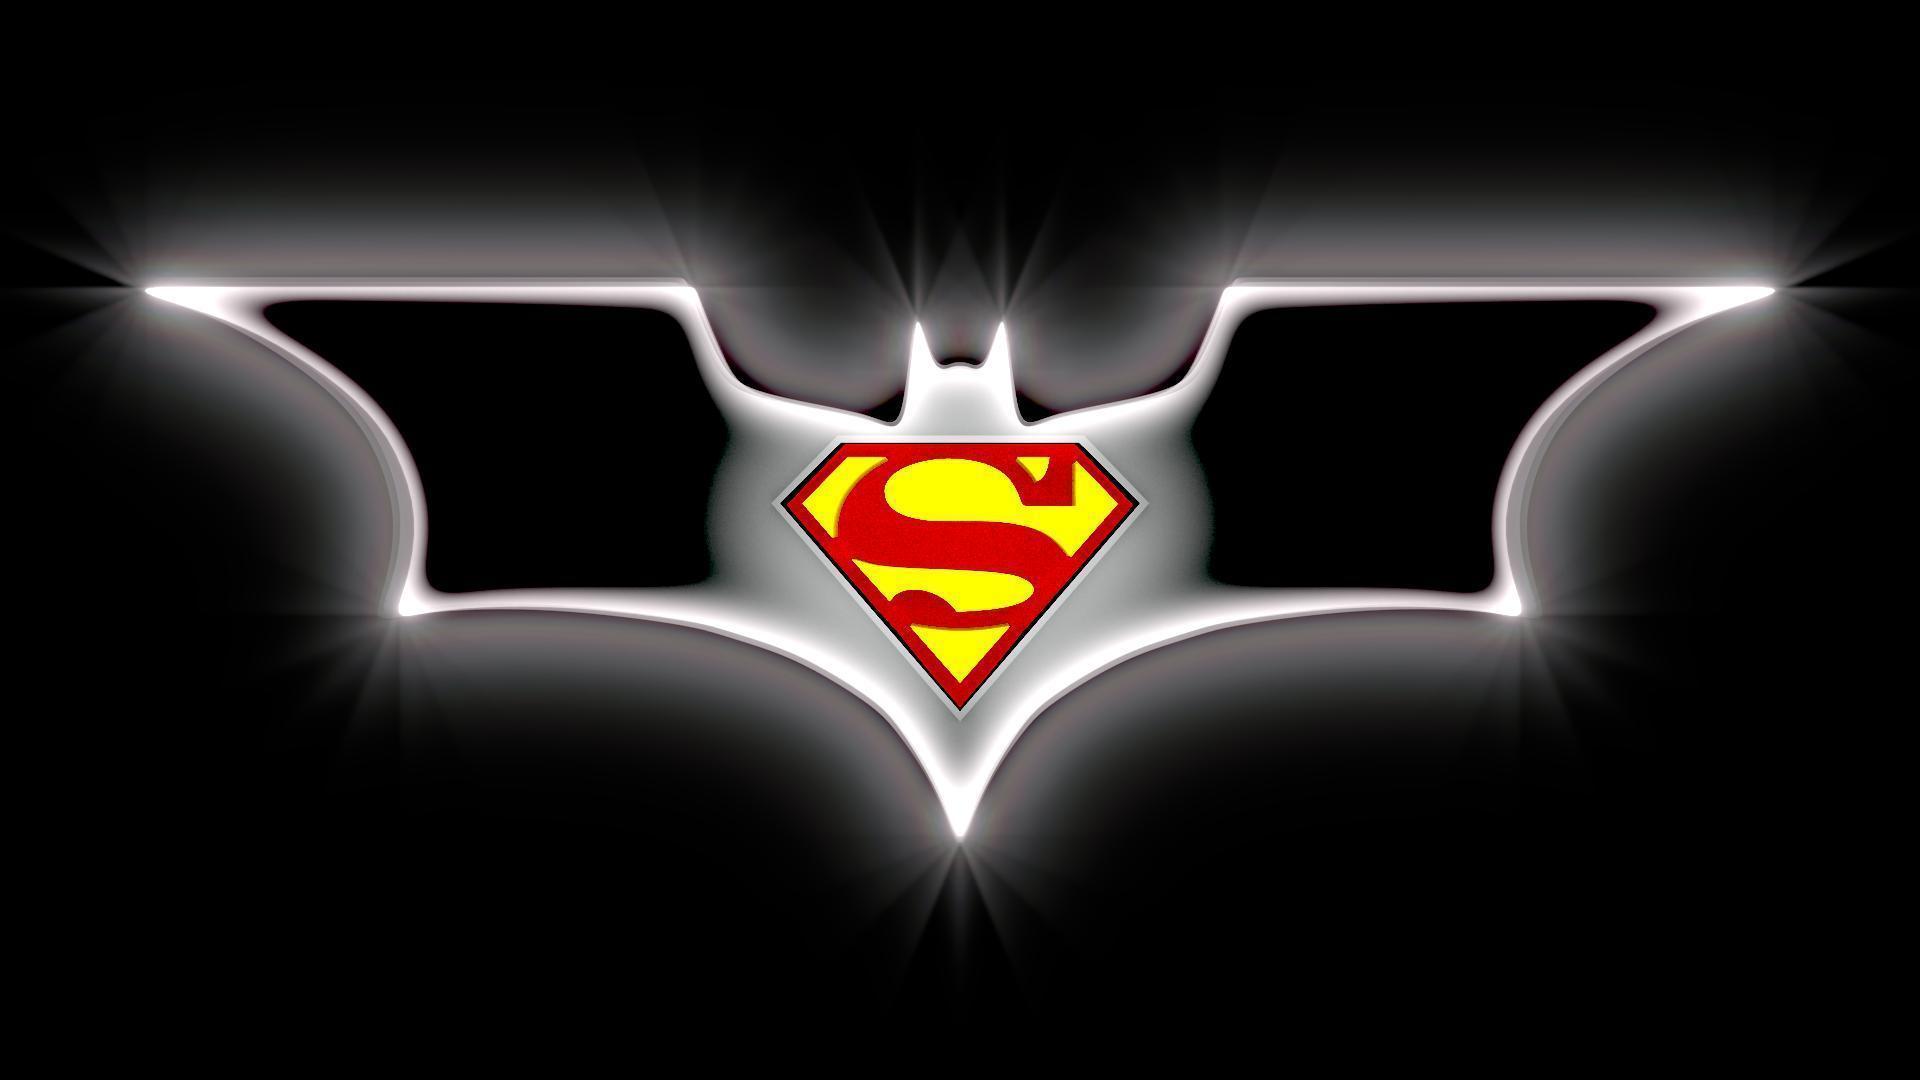 Batman VS Superman HD Wallpapers for iPhone 7 | Wallpapers ... |Batman Superman Logo Wallpaper